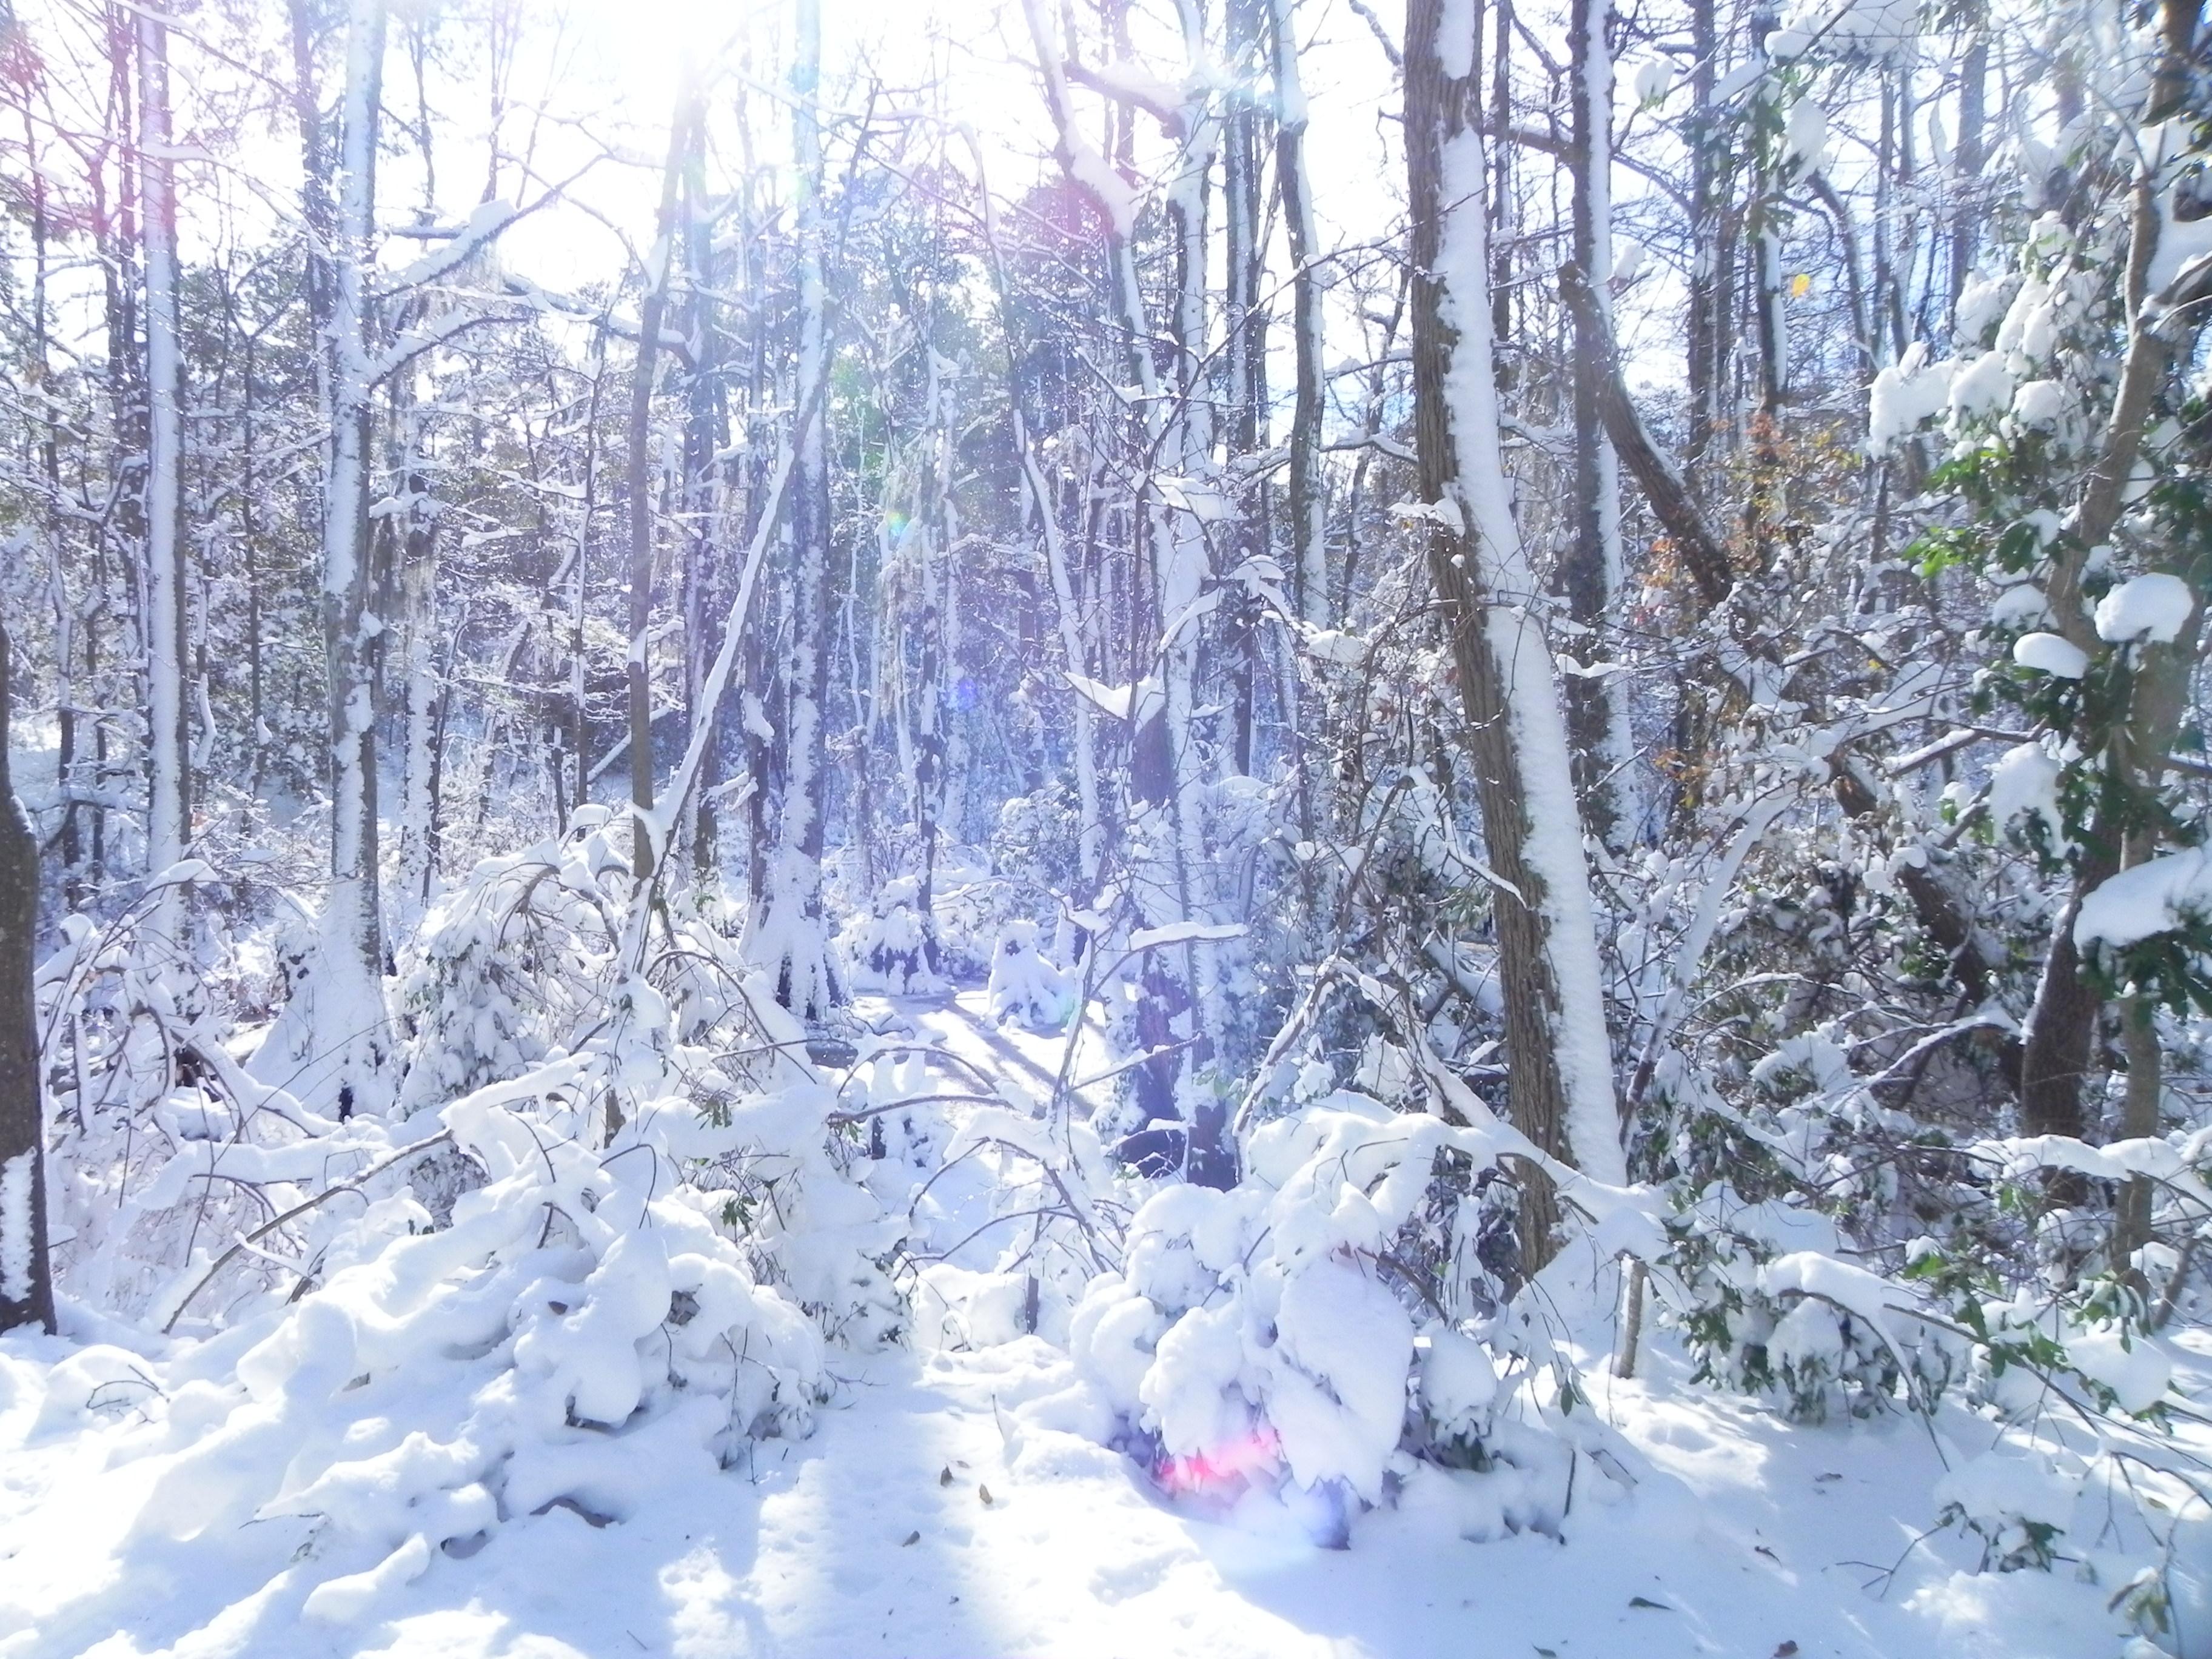 File:FL Winter Wonderland (5303509083).jpg - Wikimedia Commons